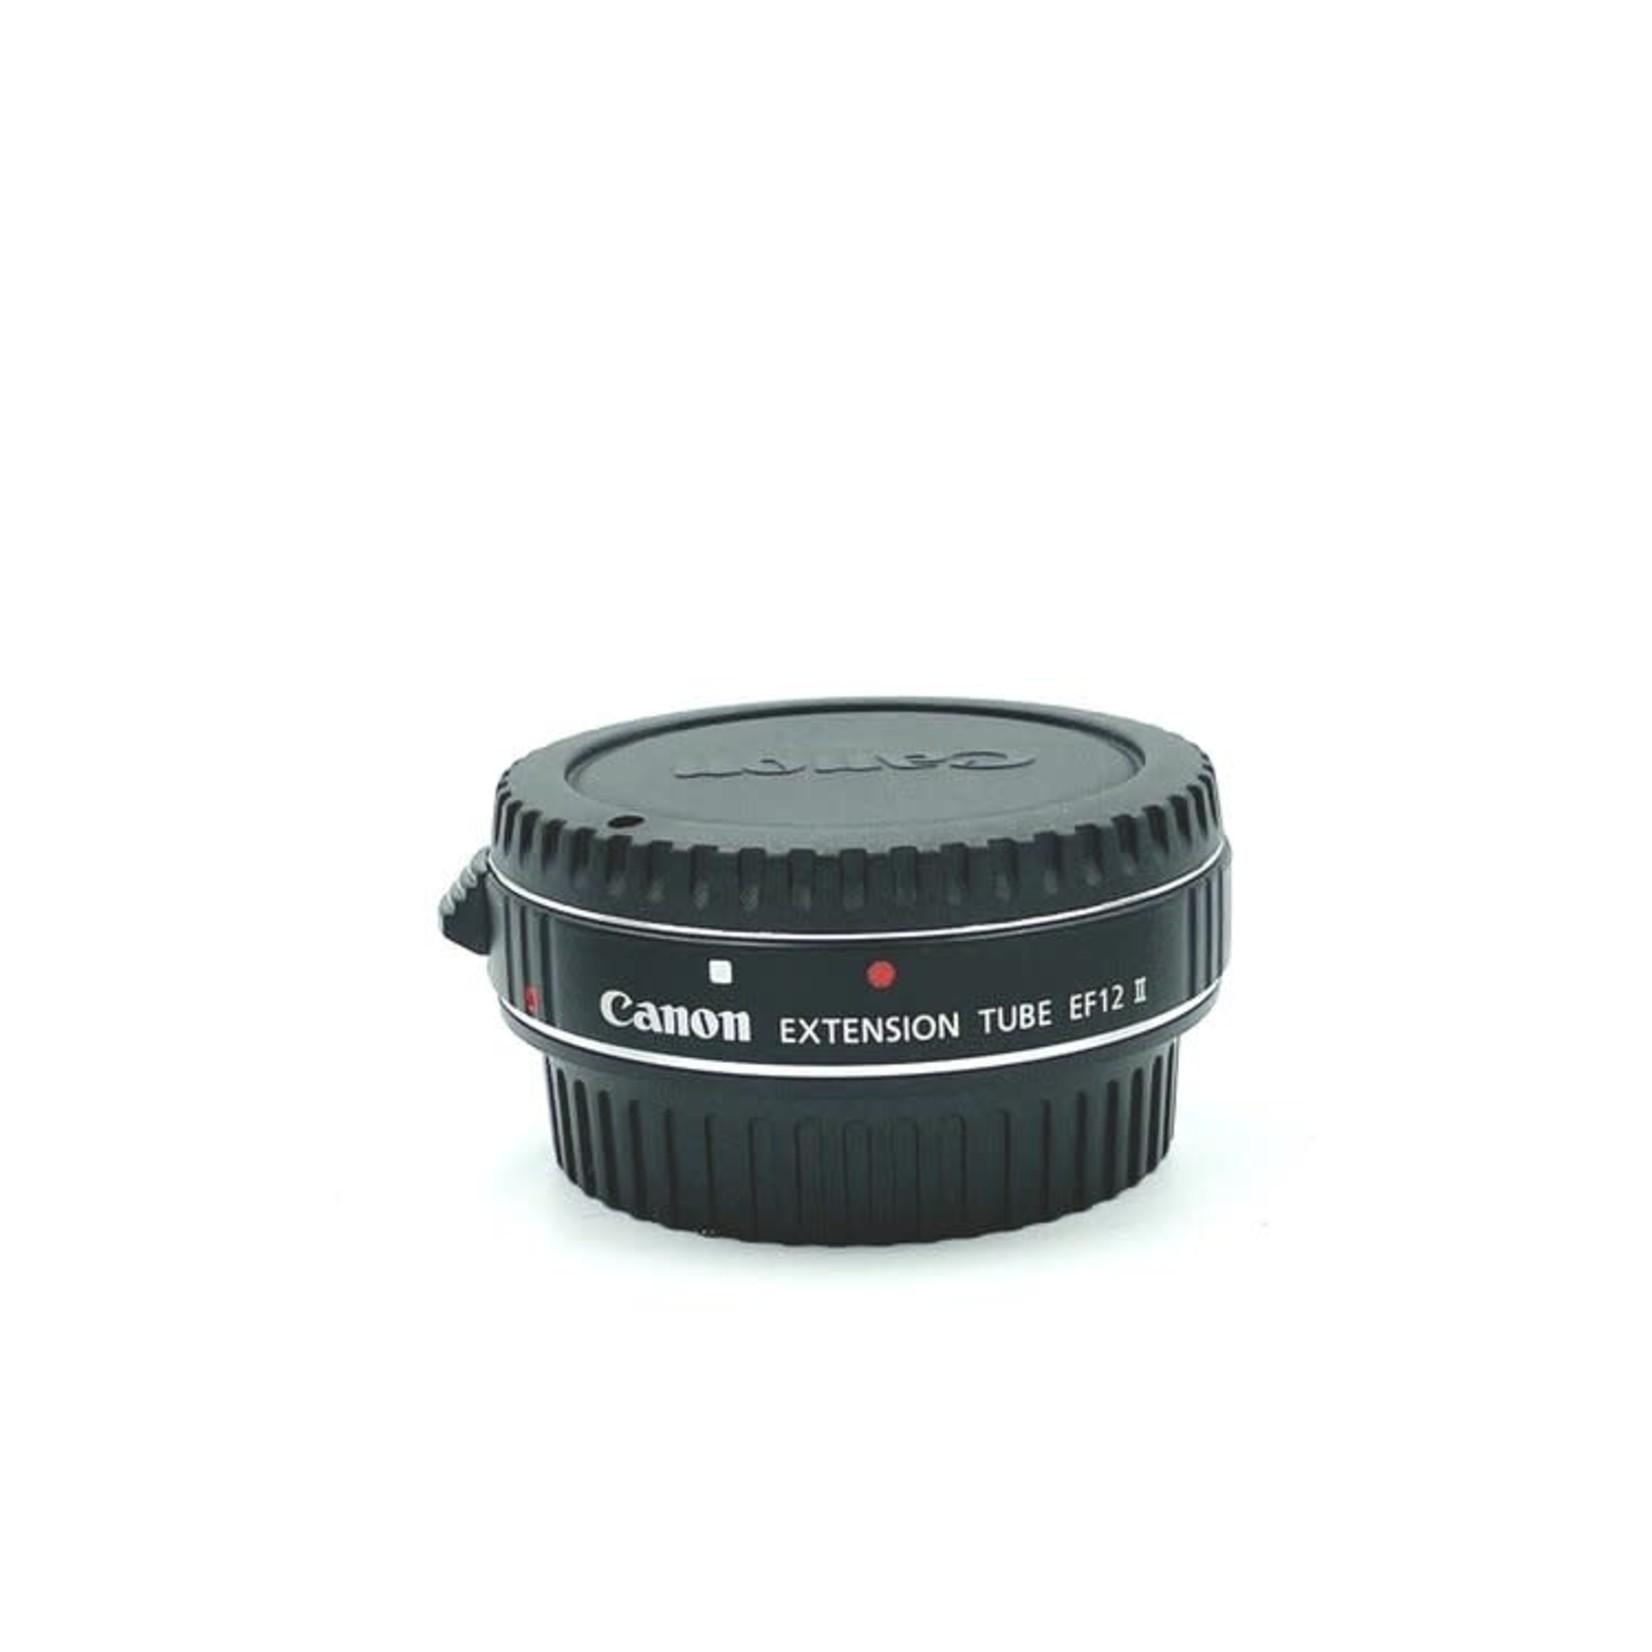 Canon Used Canon EF12 ll